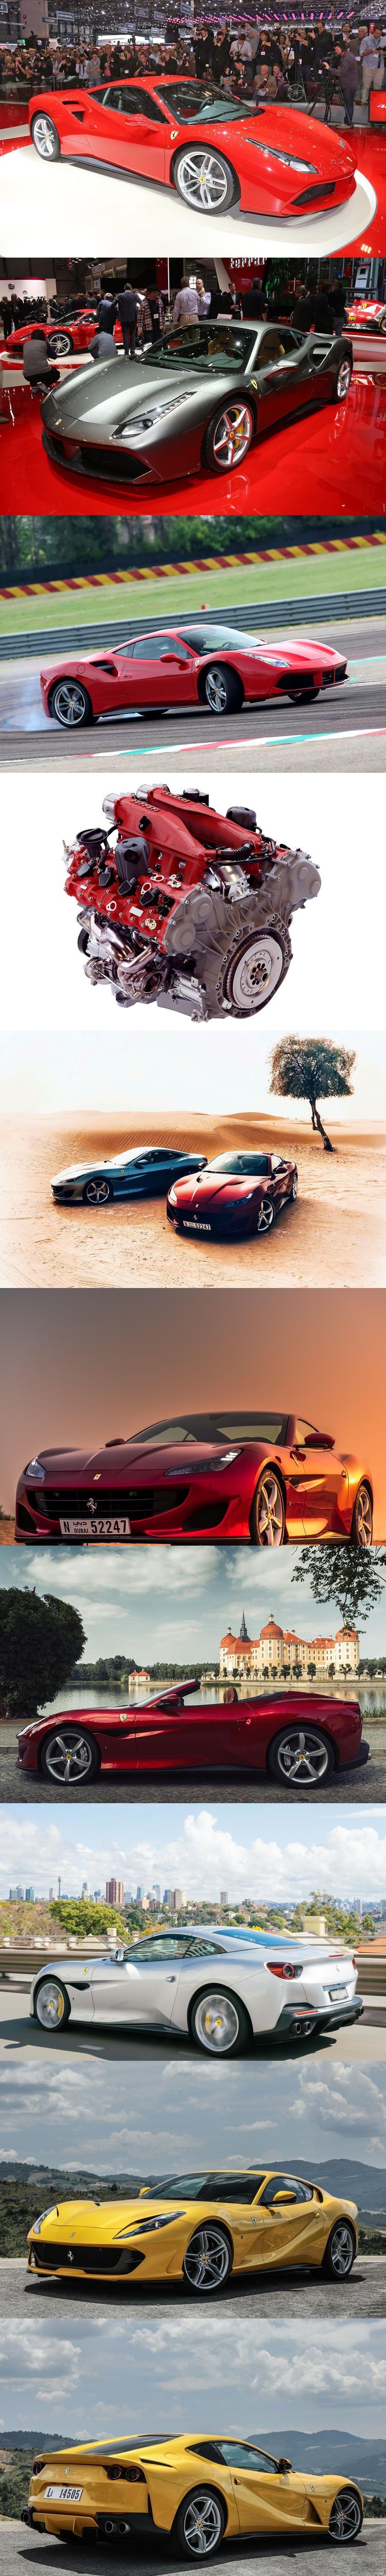 Ferrari Made Money Last Summer Thanks To Its V8 Supercars V12 Powered Models Like The 812 Superfast Also Earned A Nice Profit Super Cars Ferrari V8 Supercars